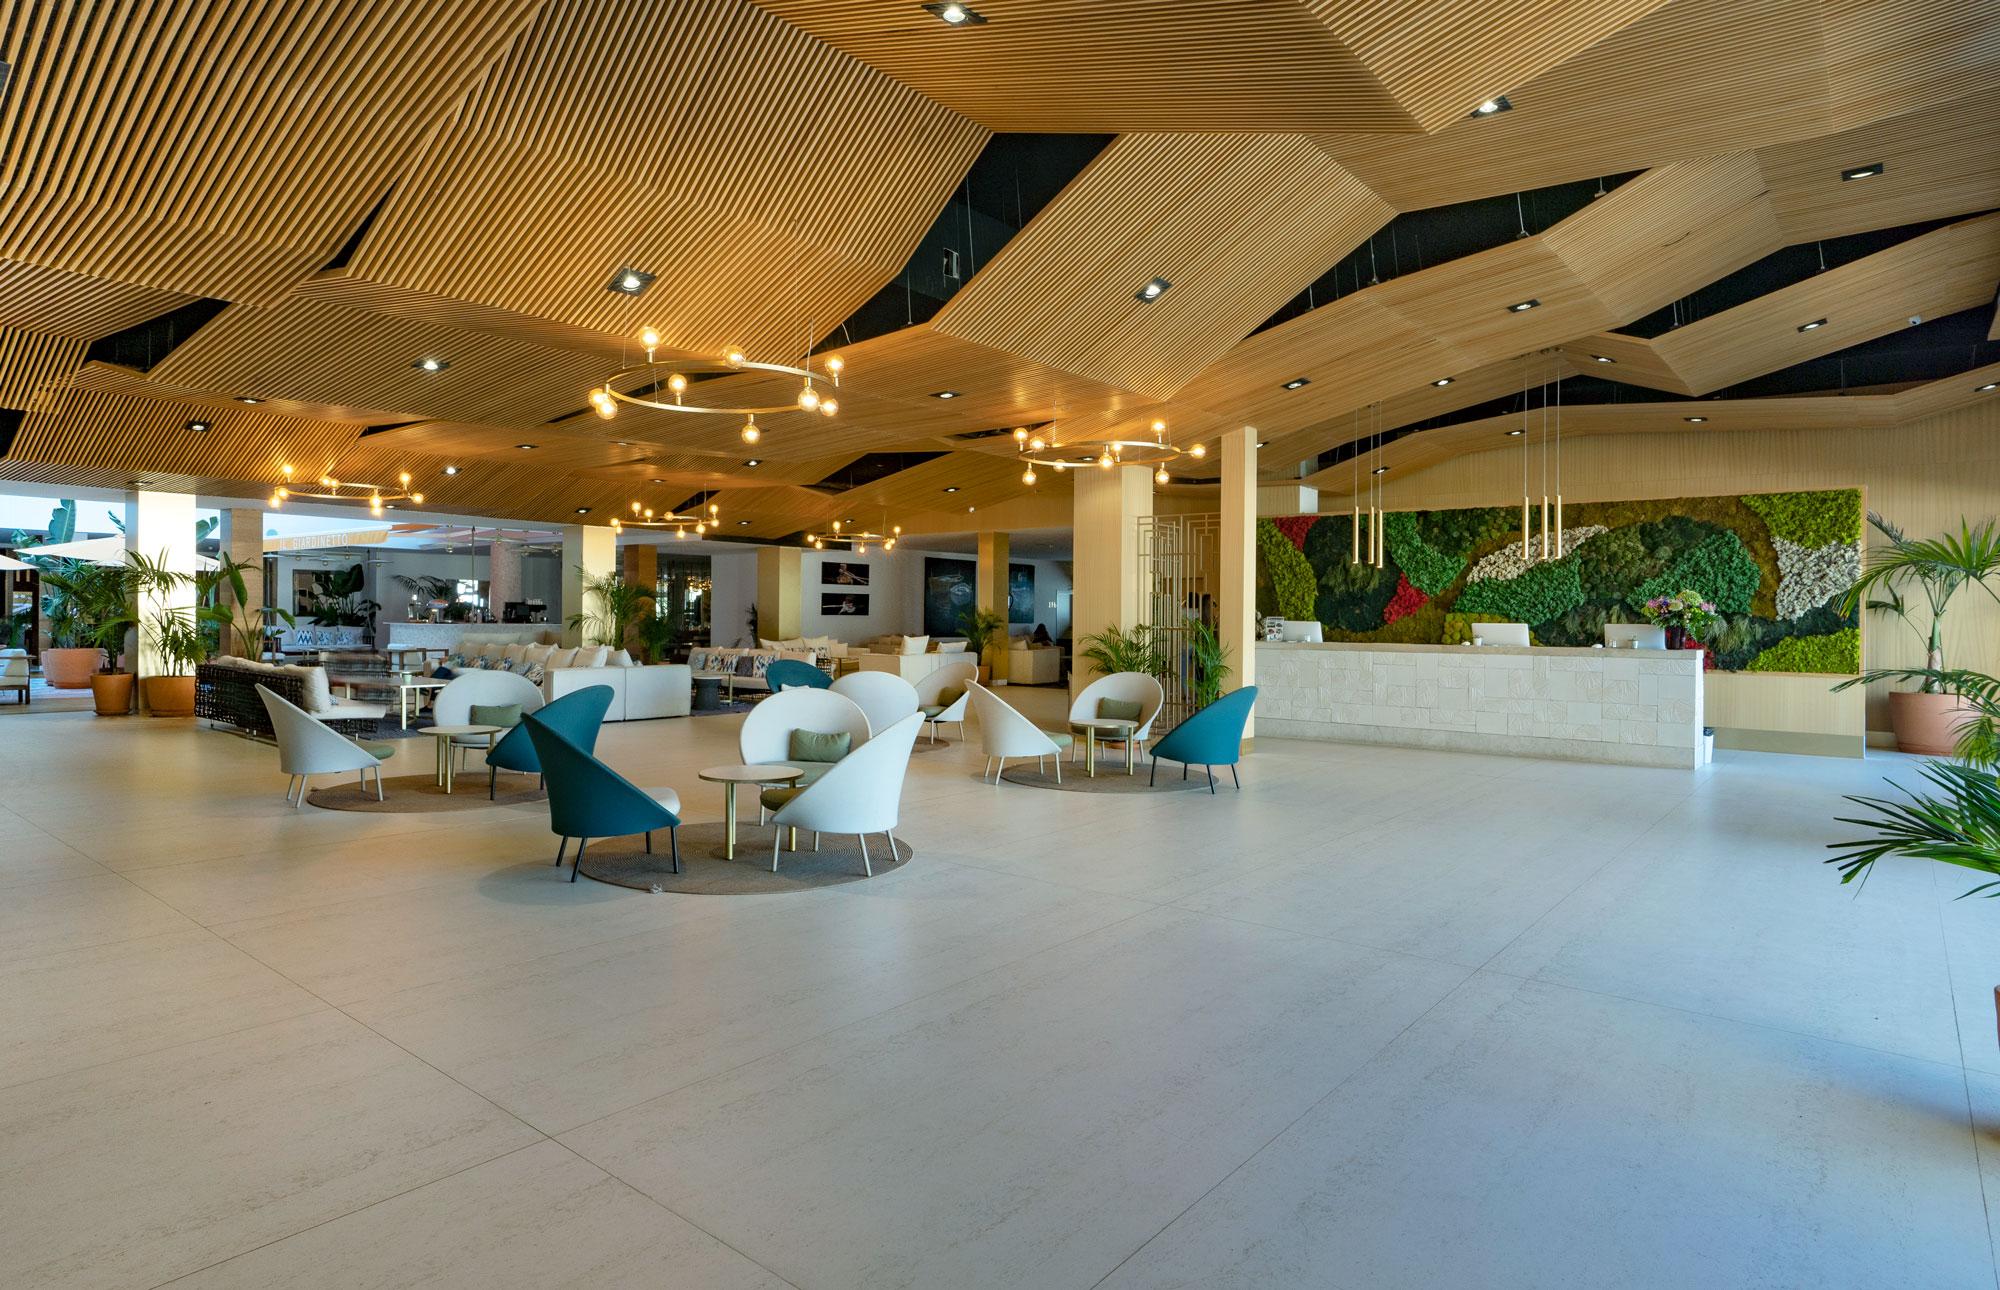 Hotel Mediterráneo  - Hotel Mediterraneo Park 1 Dekton Silestone Piedra Natural Cosentino 184